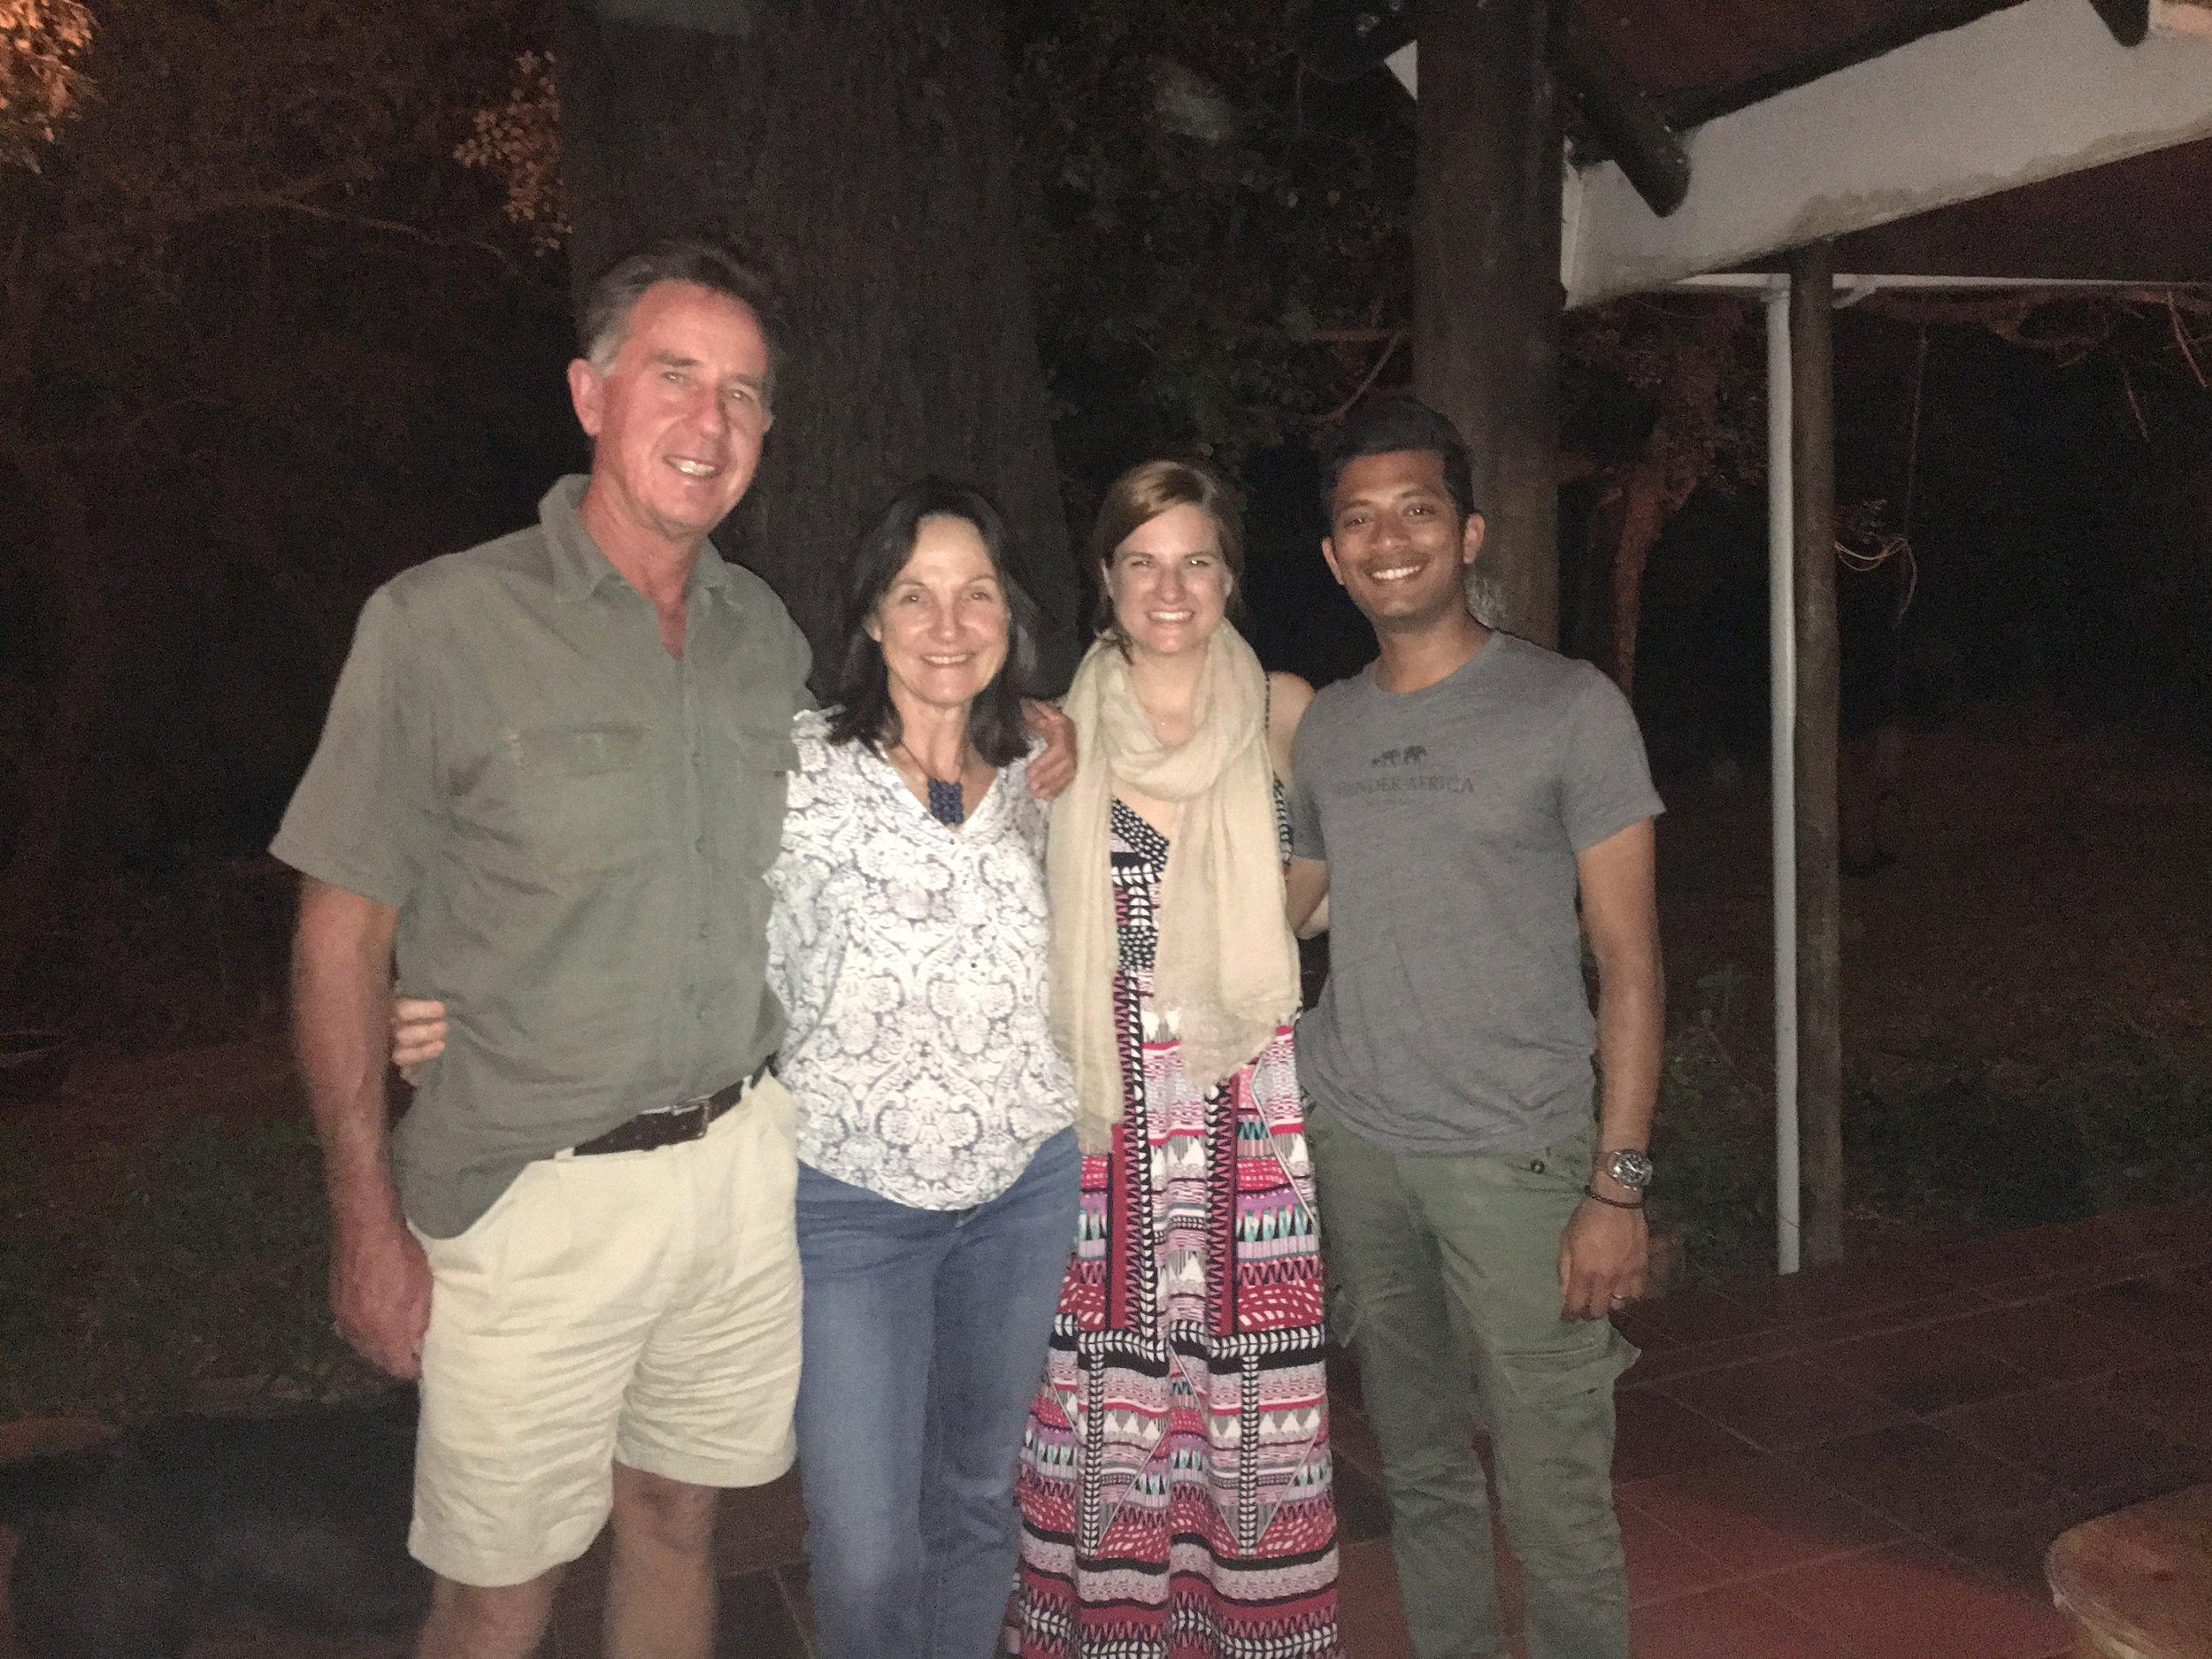 Legendary guide David and Robyn Foot of David Foot Safaris